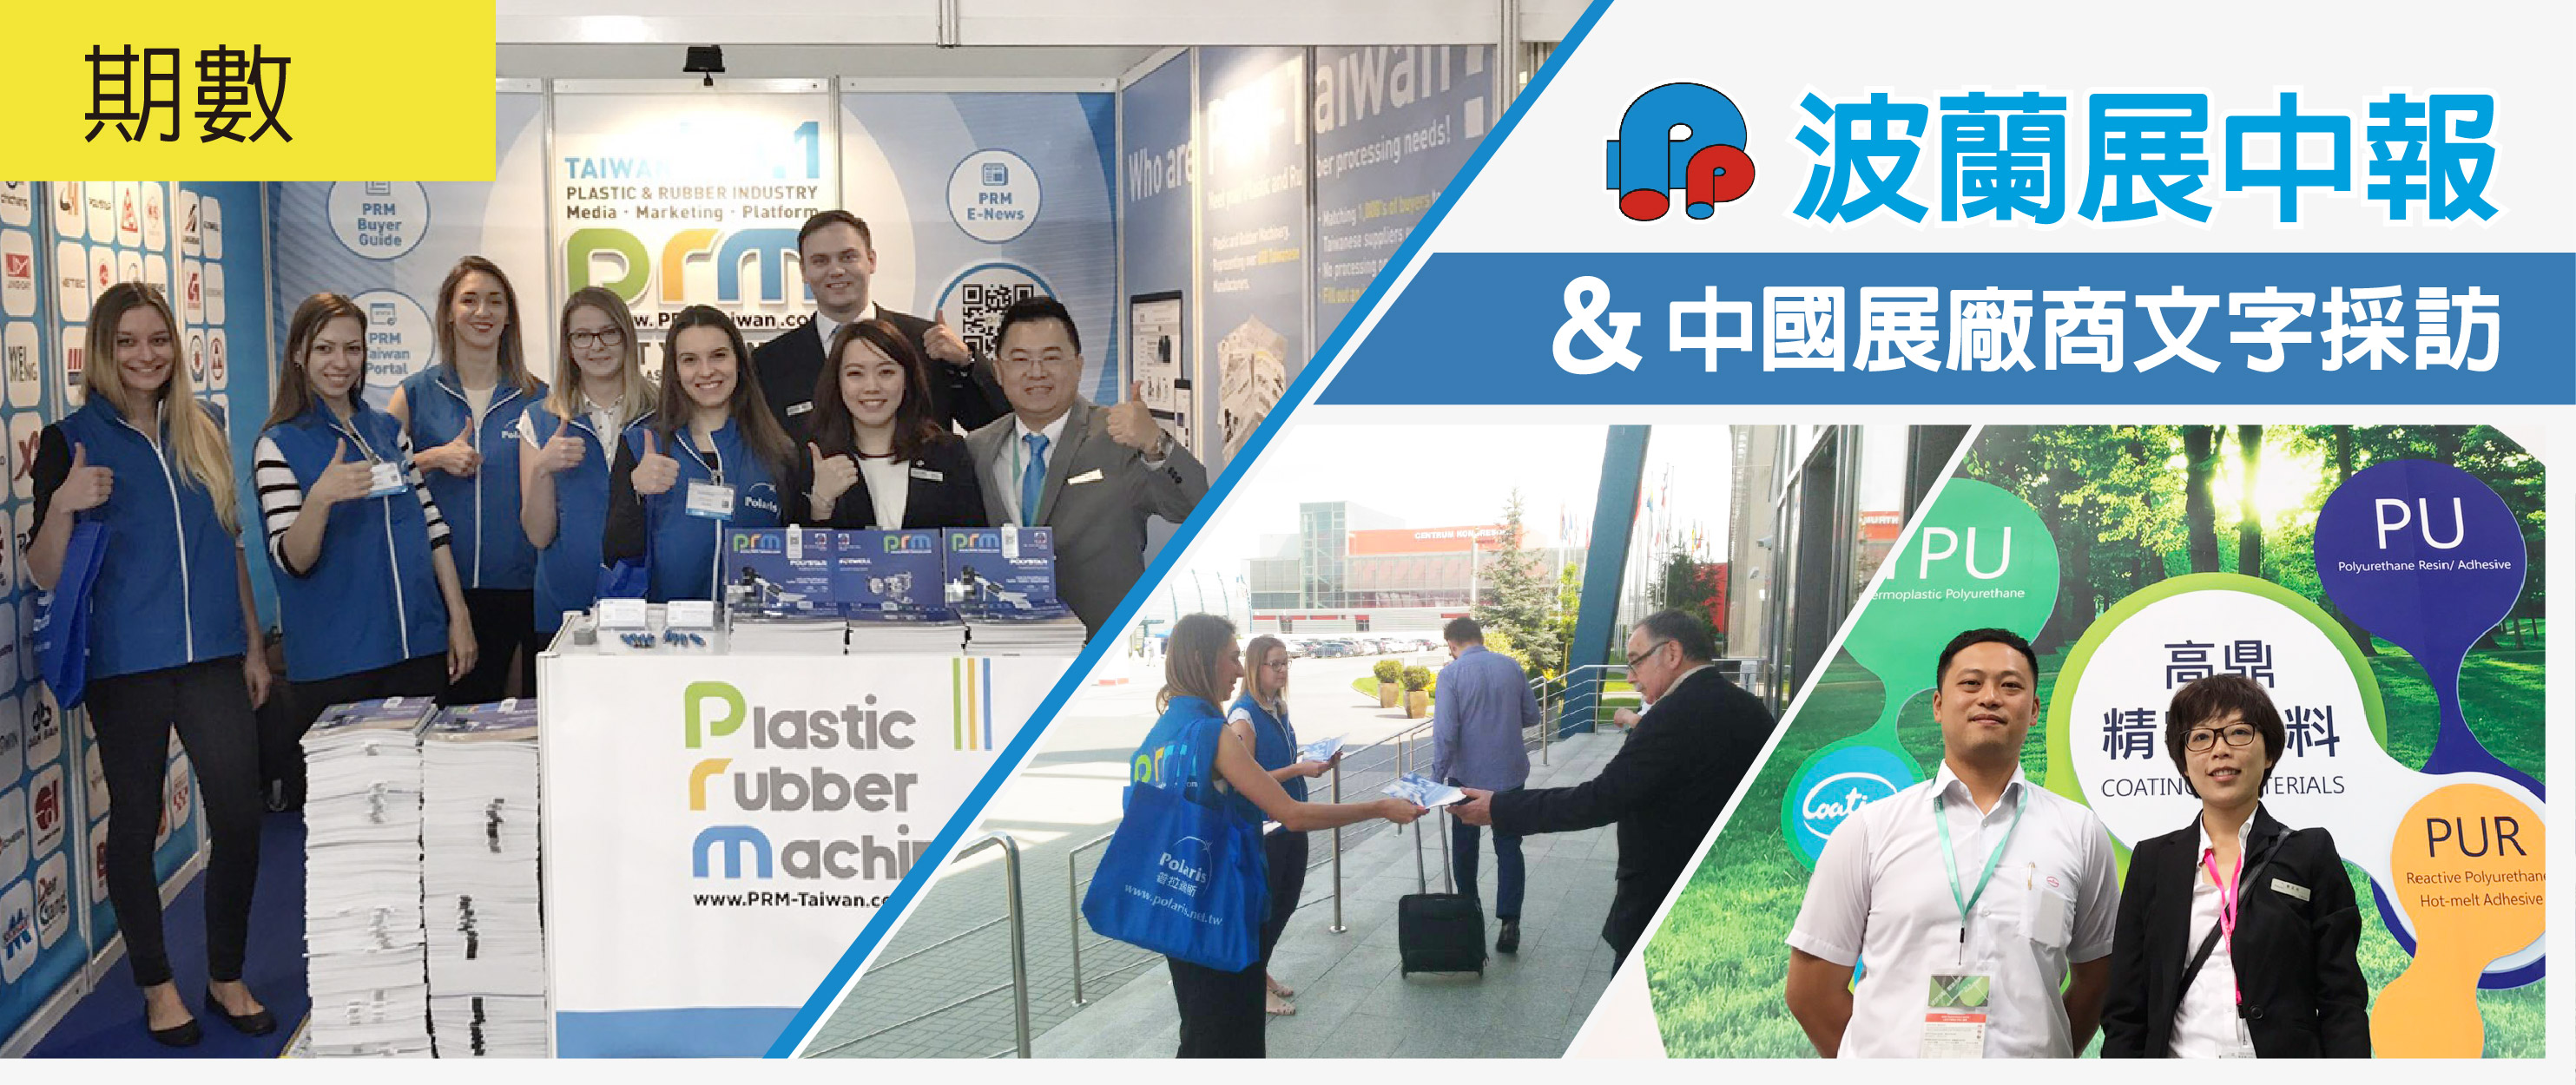 <a href='main_P20170524001.html' target='_self'>2017年PRM-Taiwan代表普拉瑞斯第一次遠赴Plastpol波蘭國際塑橡膠展,是迄今為止最引人注目的展覽之一。 ...(讀更多)</a>